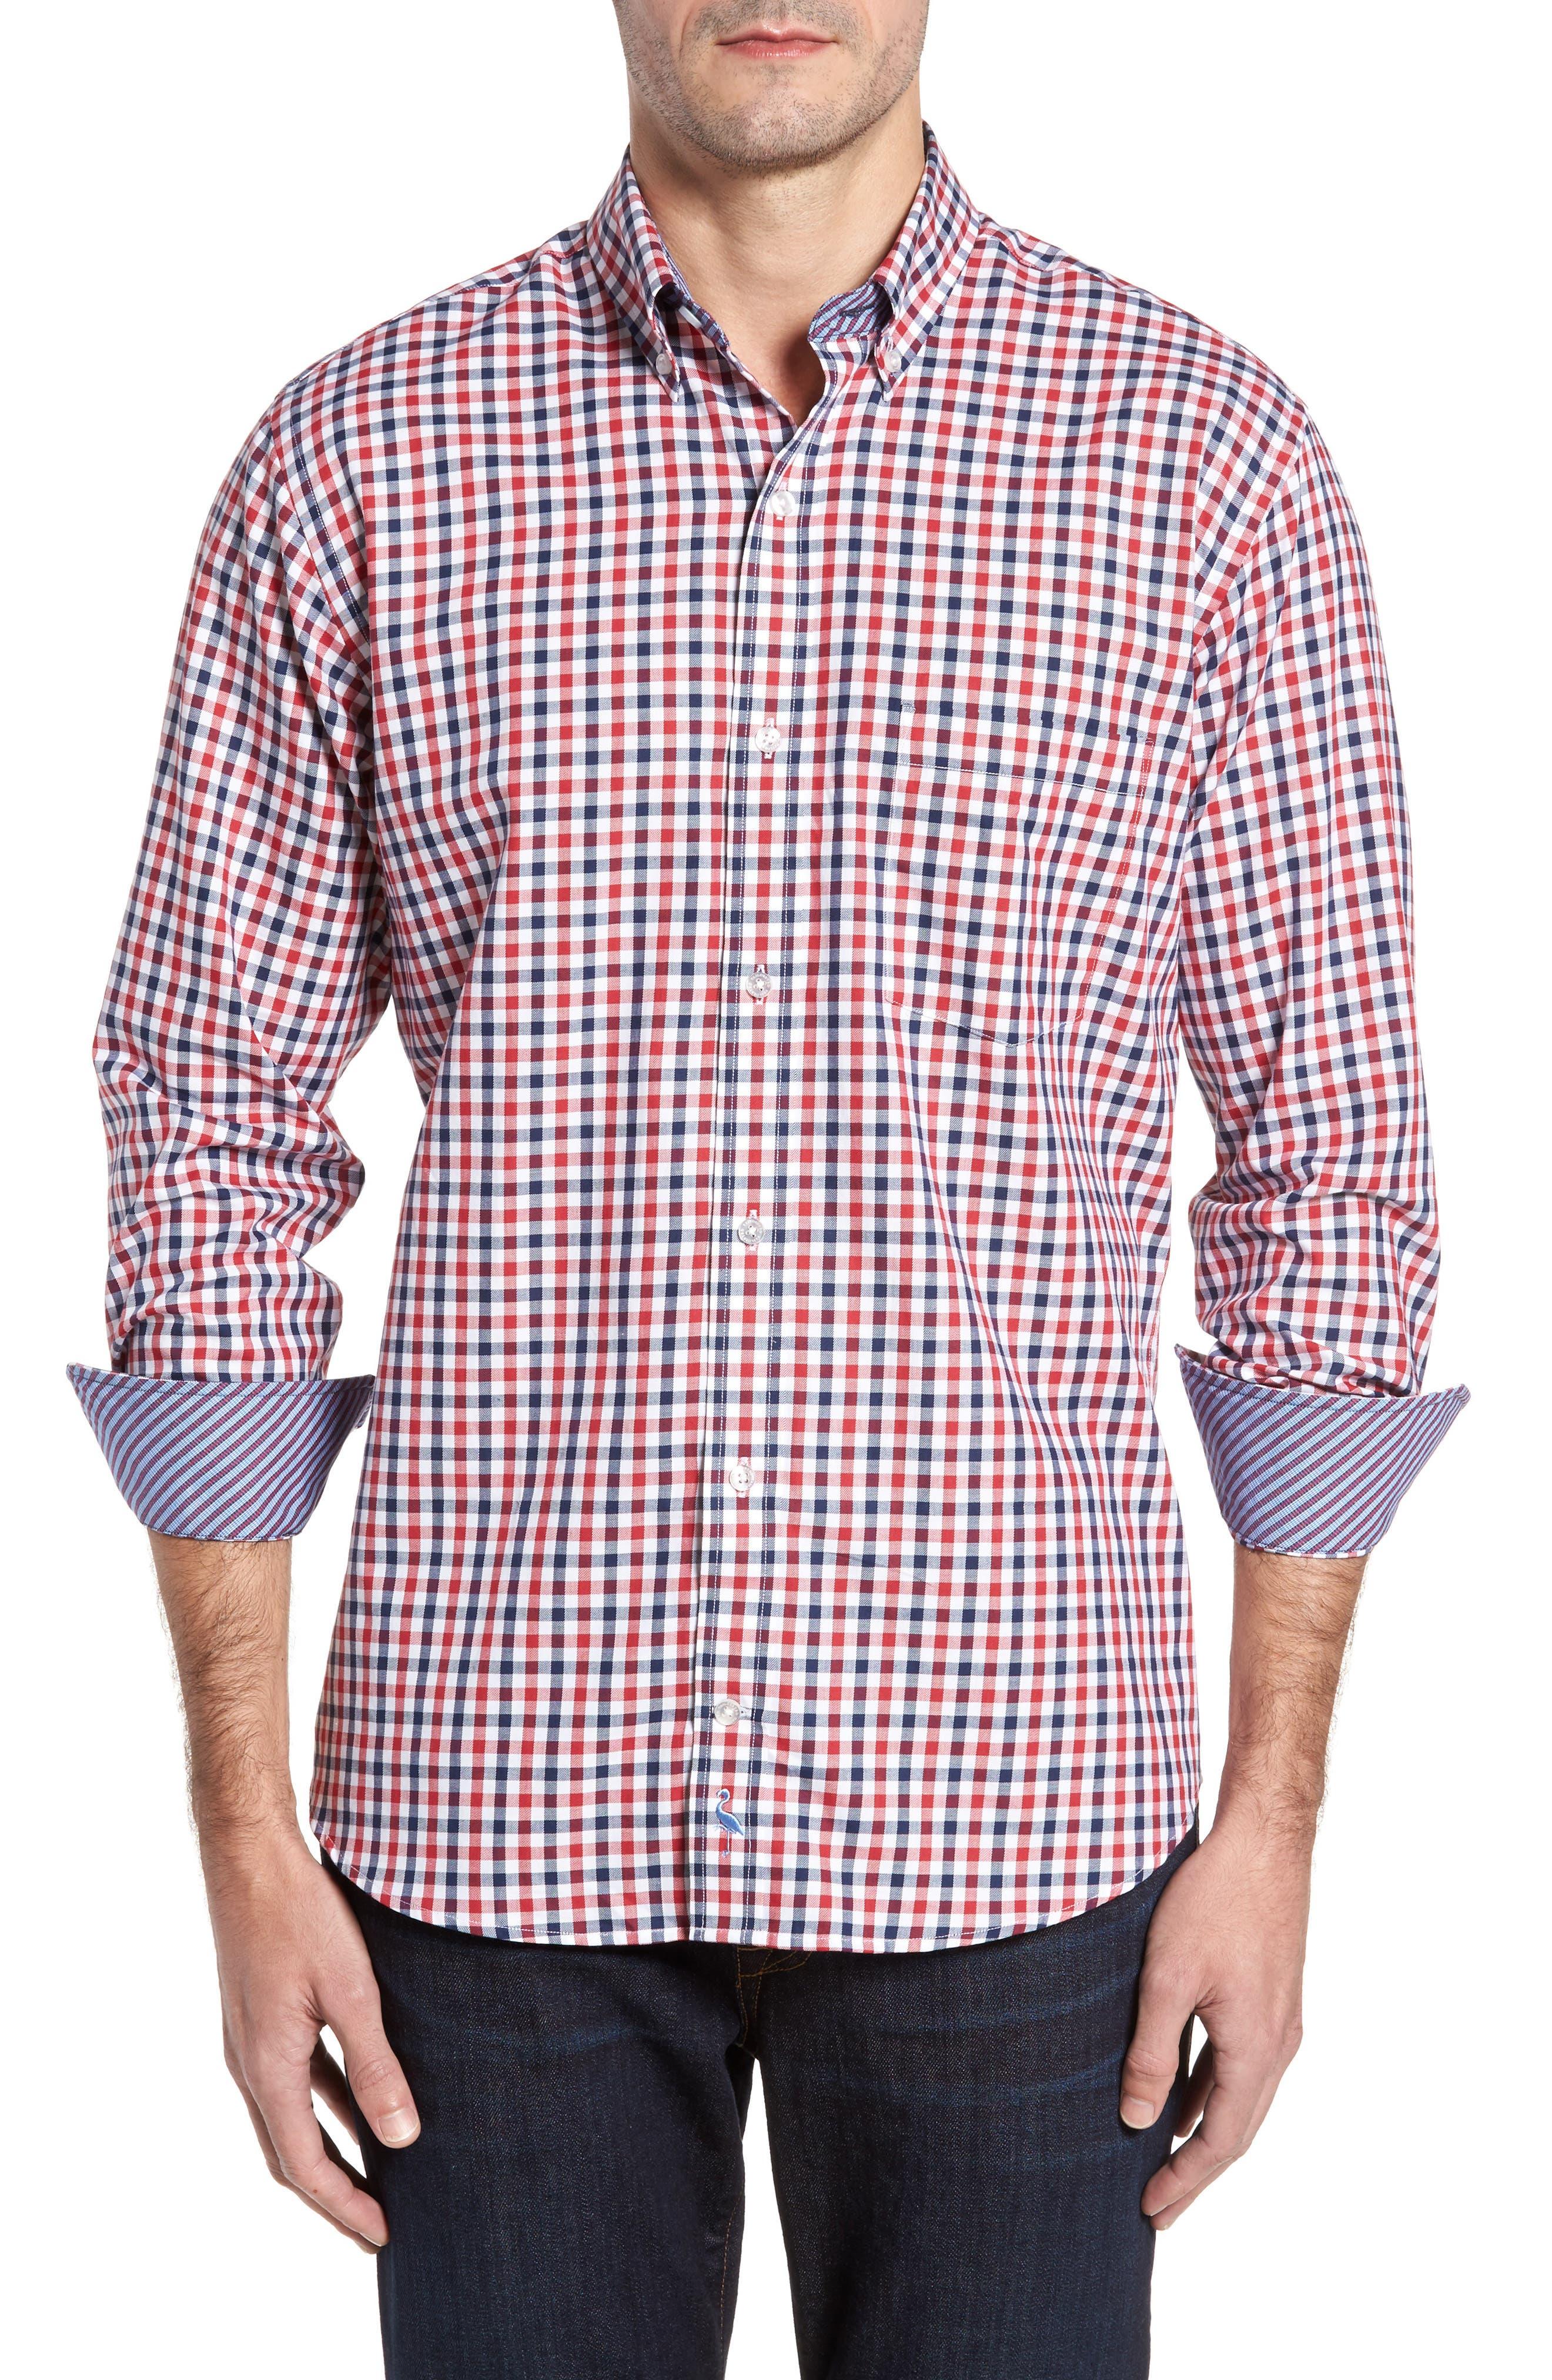 Bernice Check Sport Shirt,                             Main thumbnail 1, color,                             600